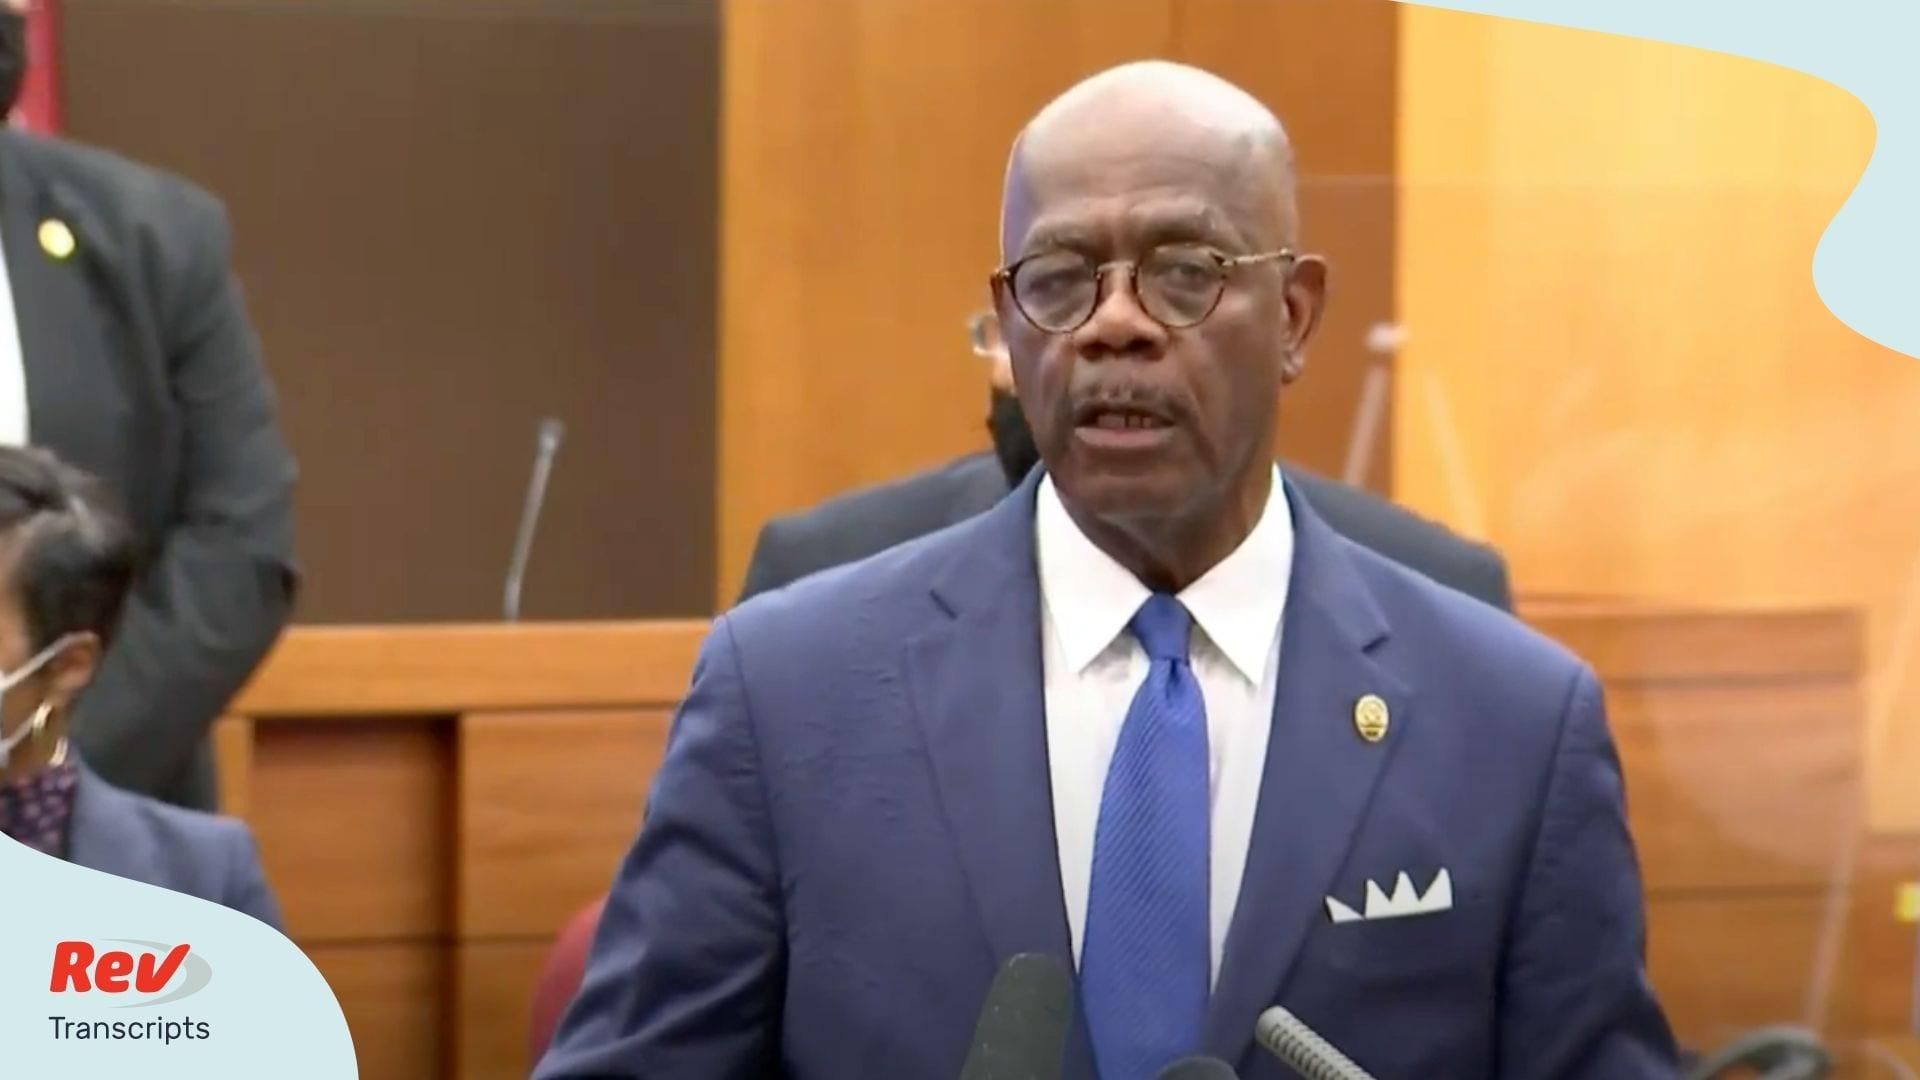 Atlanta DA Announces Charges in Rayshard Brooks Killing